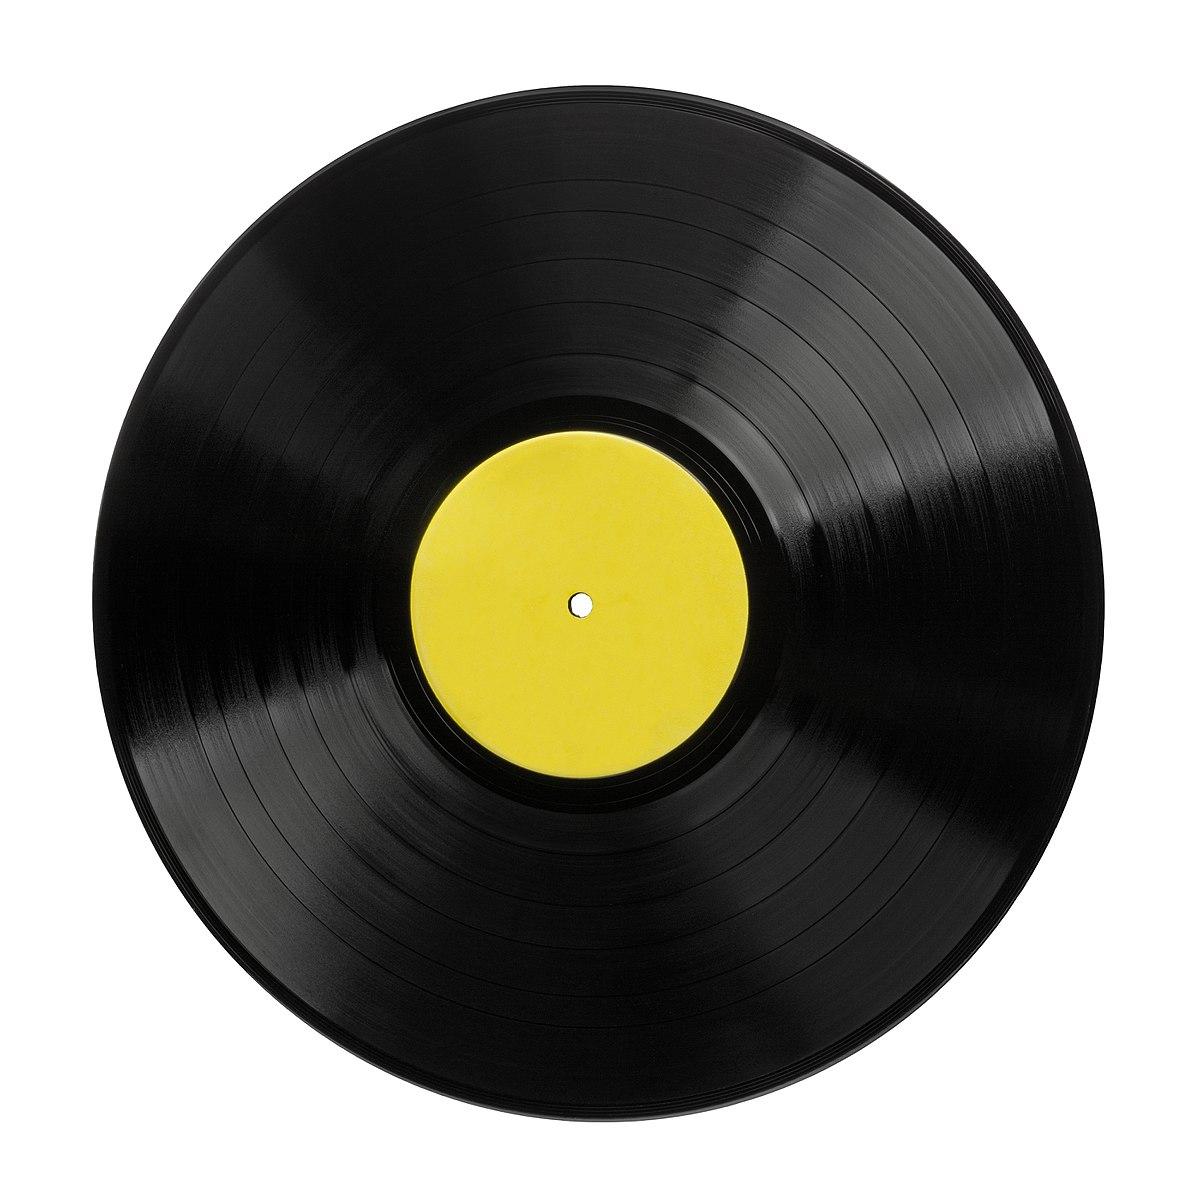 The Cheap Vinyl Thread